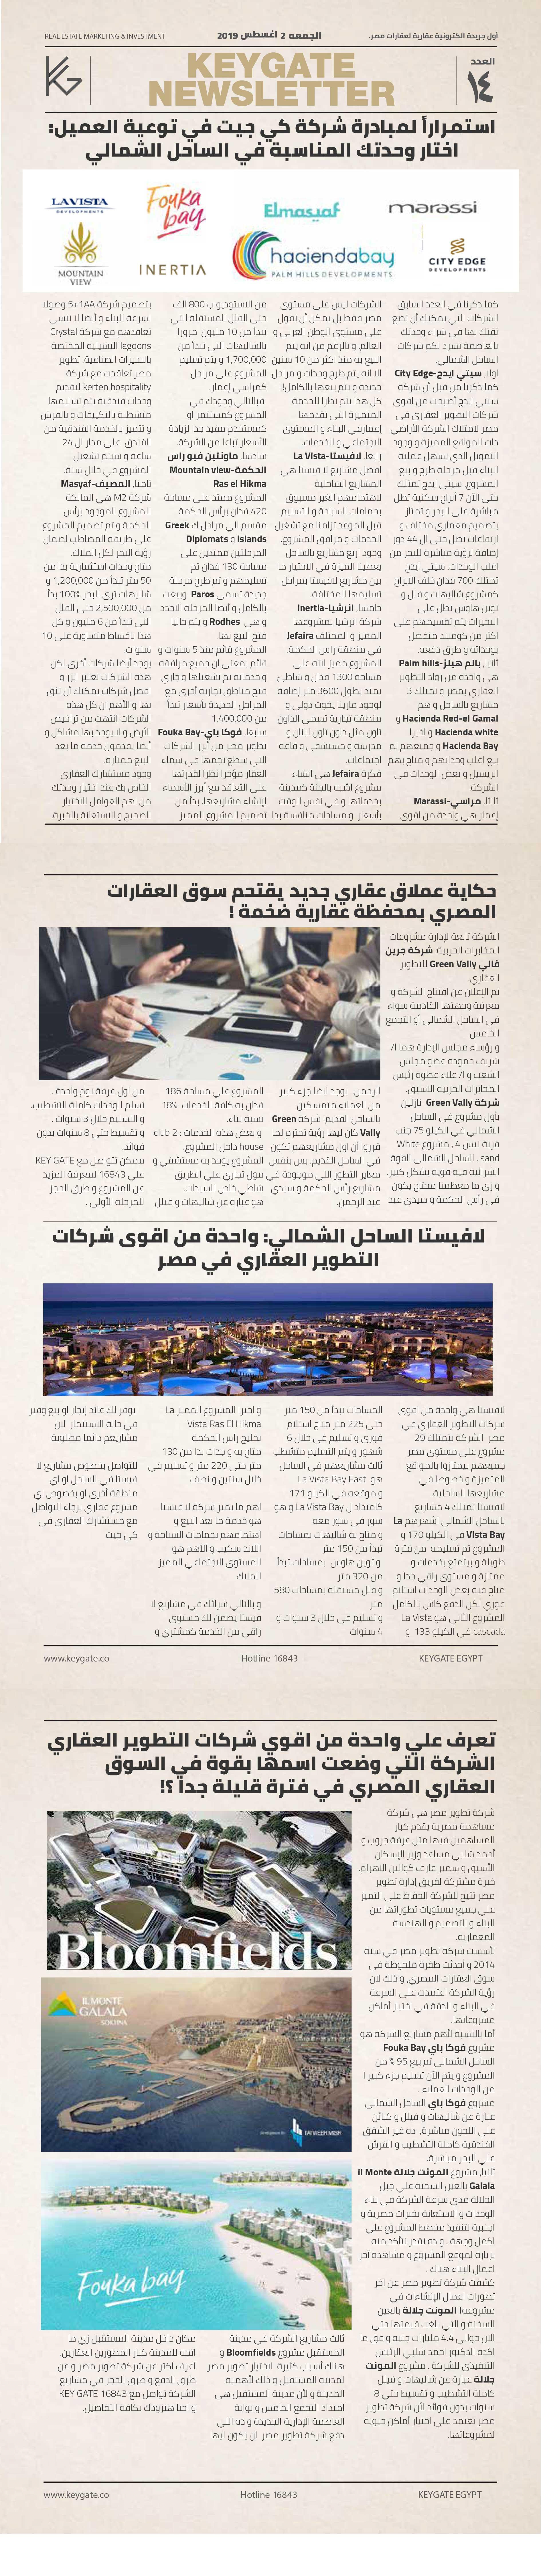 KeyGate Real Estate' Newspaper 25-7-2019